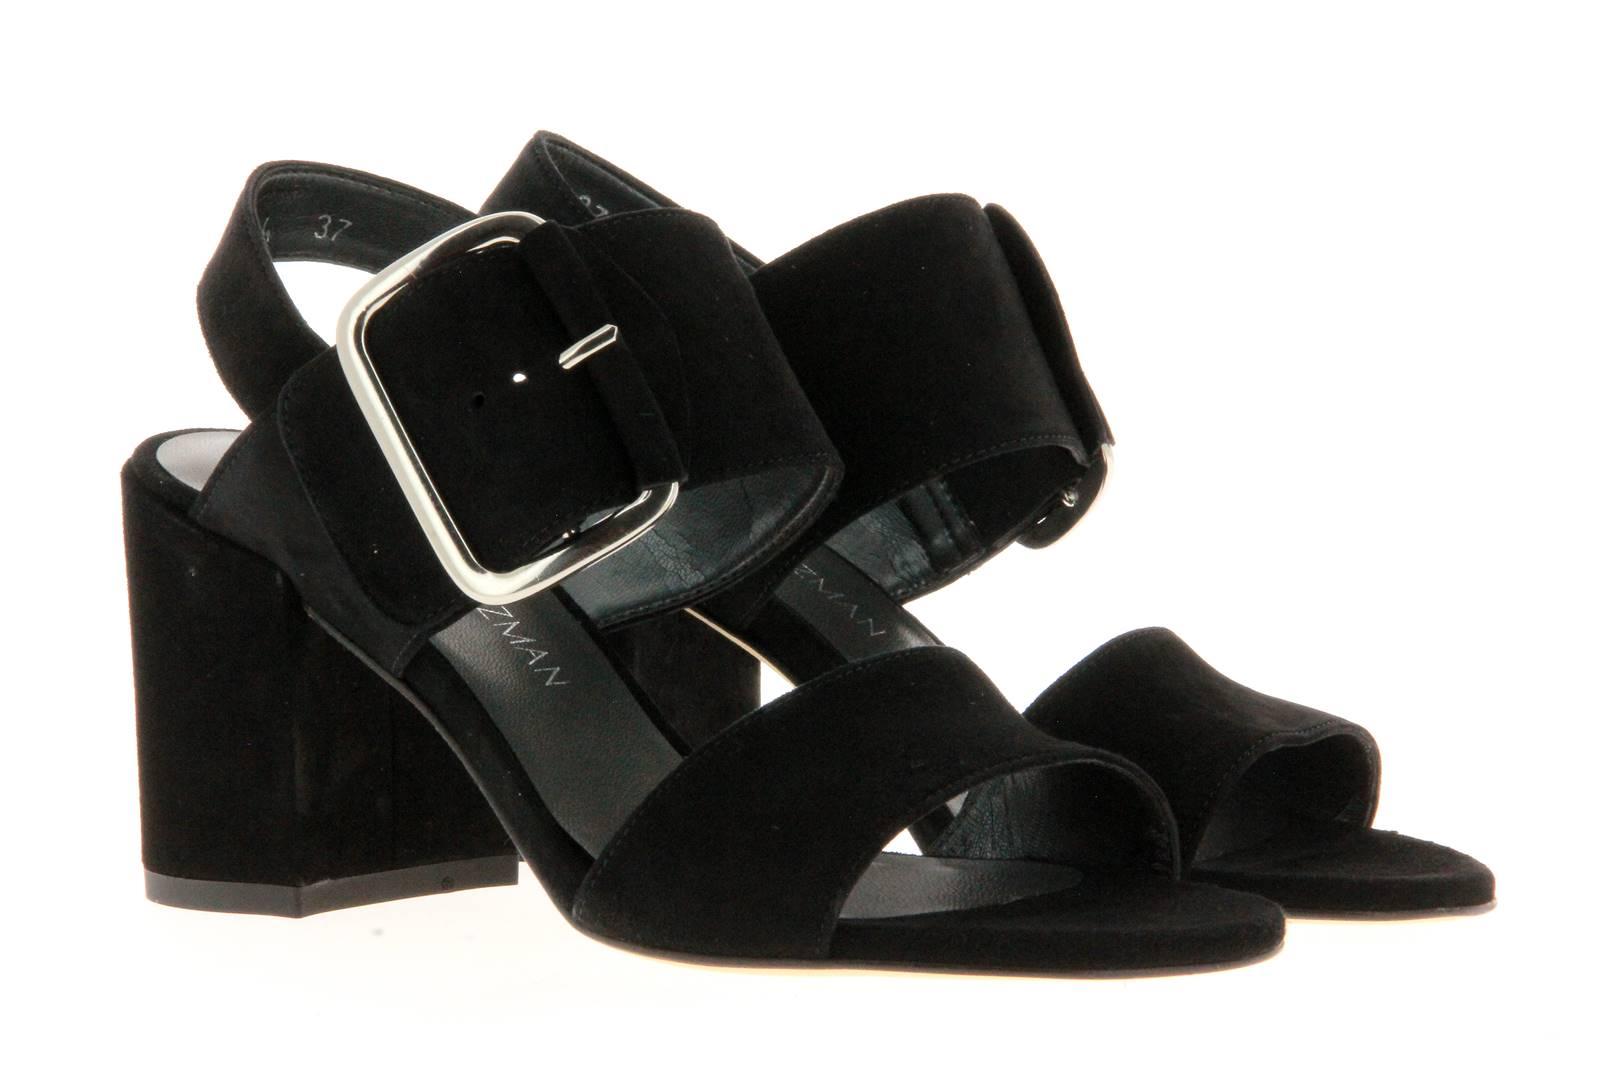 Stuart Weitzman sandal CITYSANDAL BLACK SUEDE